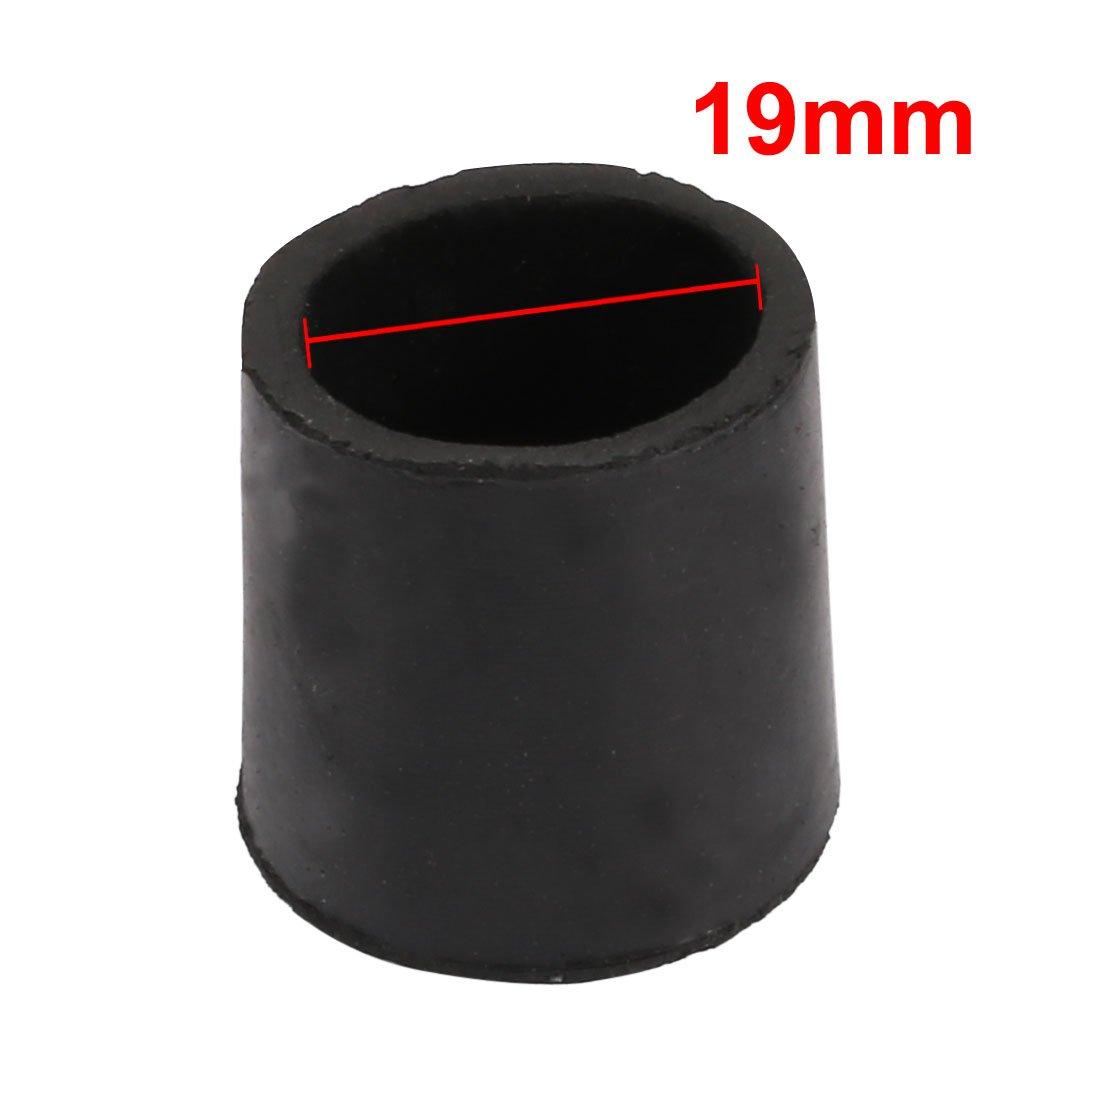 sourcingmap 2Pcs Furniture Table Chair Round Rubber Leg Tip Cap 19mm Inner Diameter